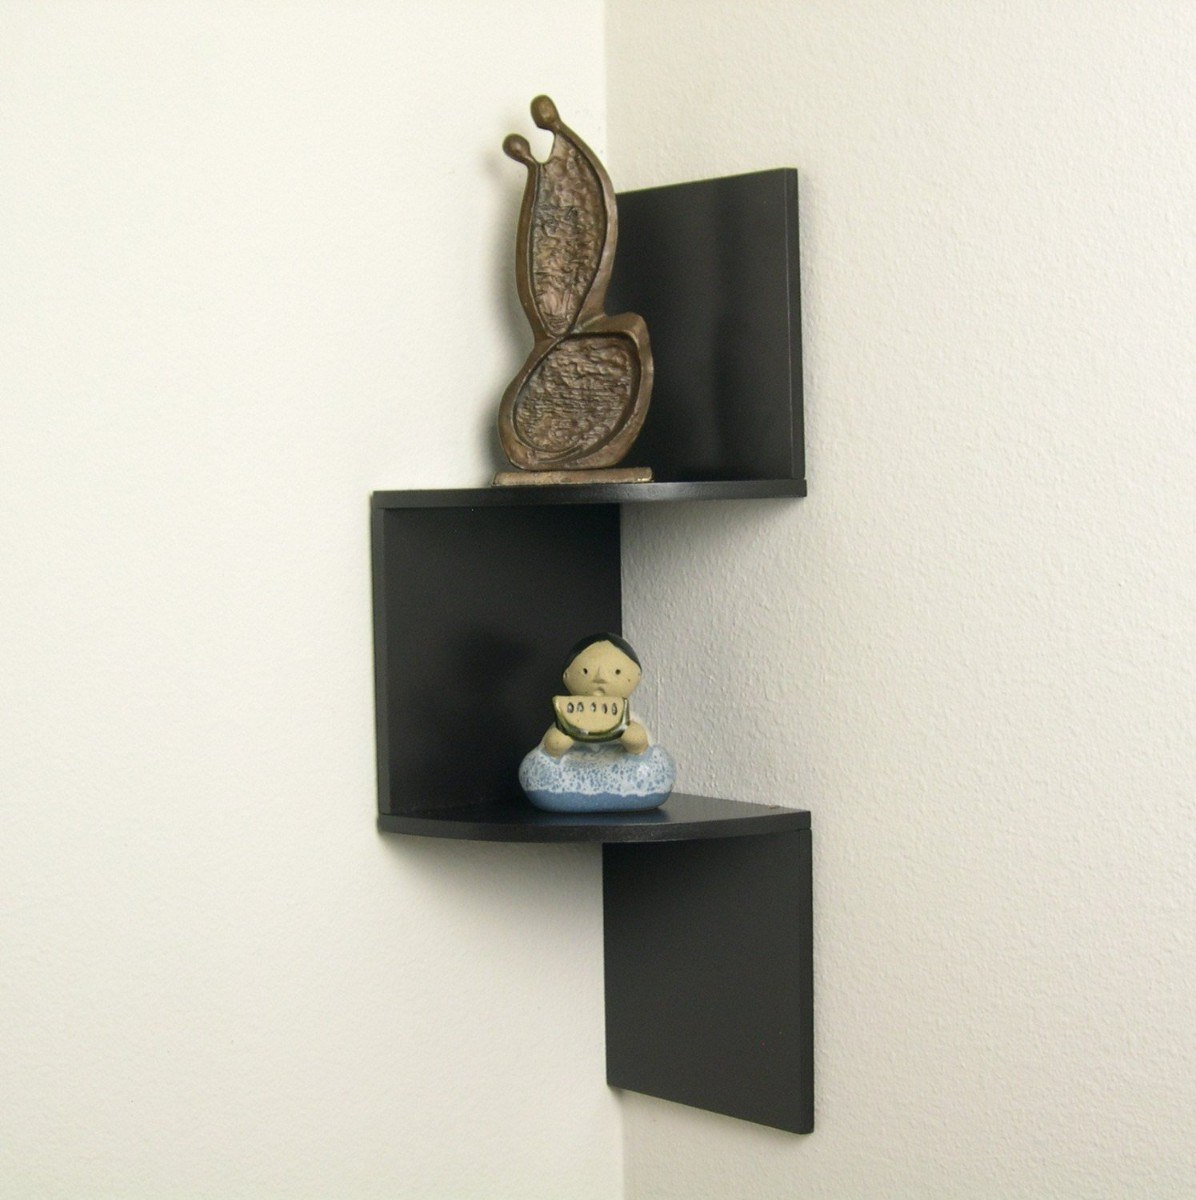 Estante esquinero moderno y elegante corner shelf vbf for Esquineros para paredes